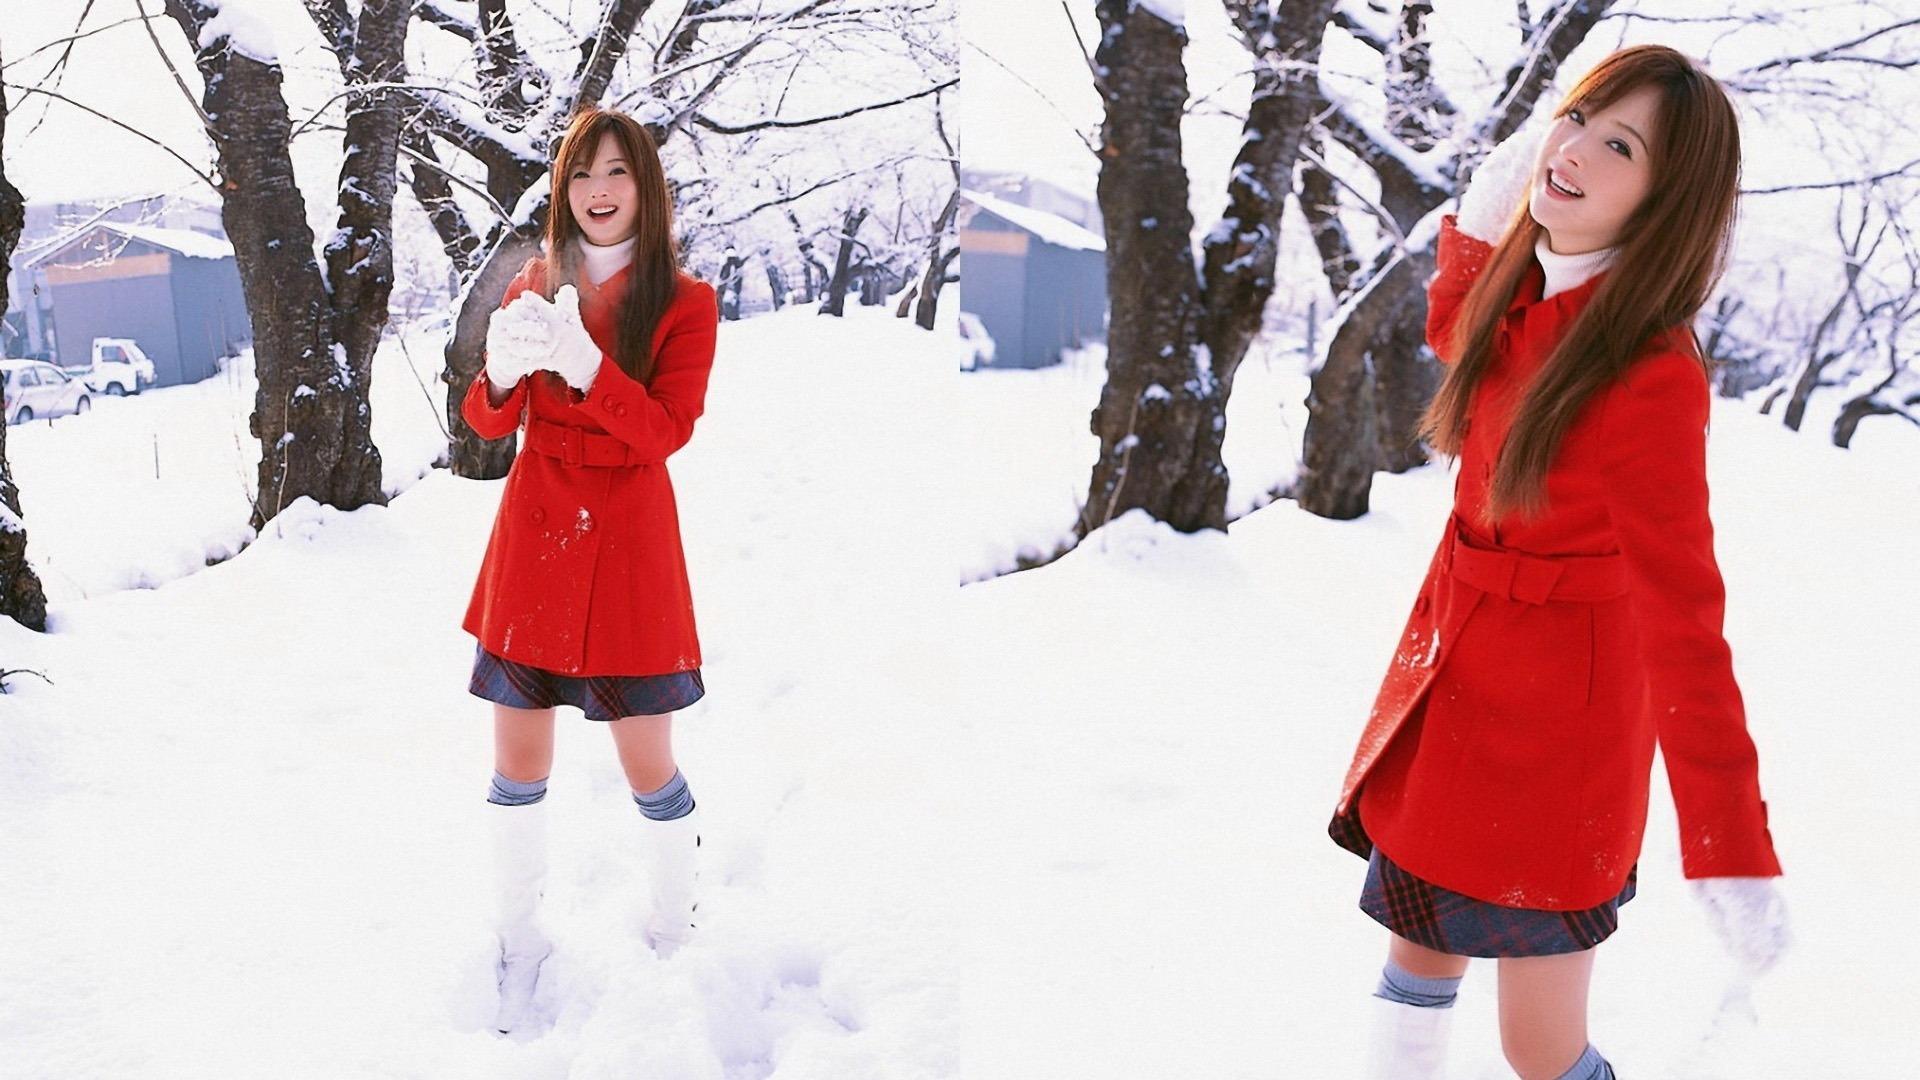 Nozomi Sasaki beautiful photo HD Wallpaper